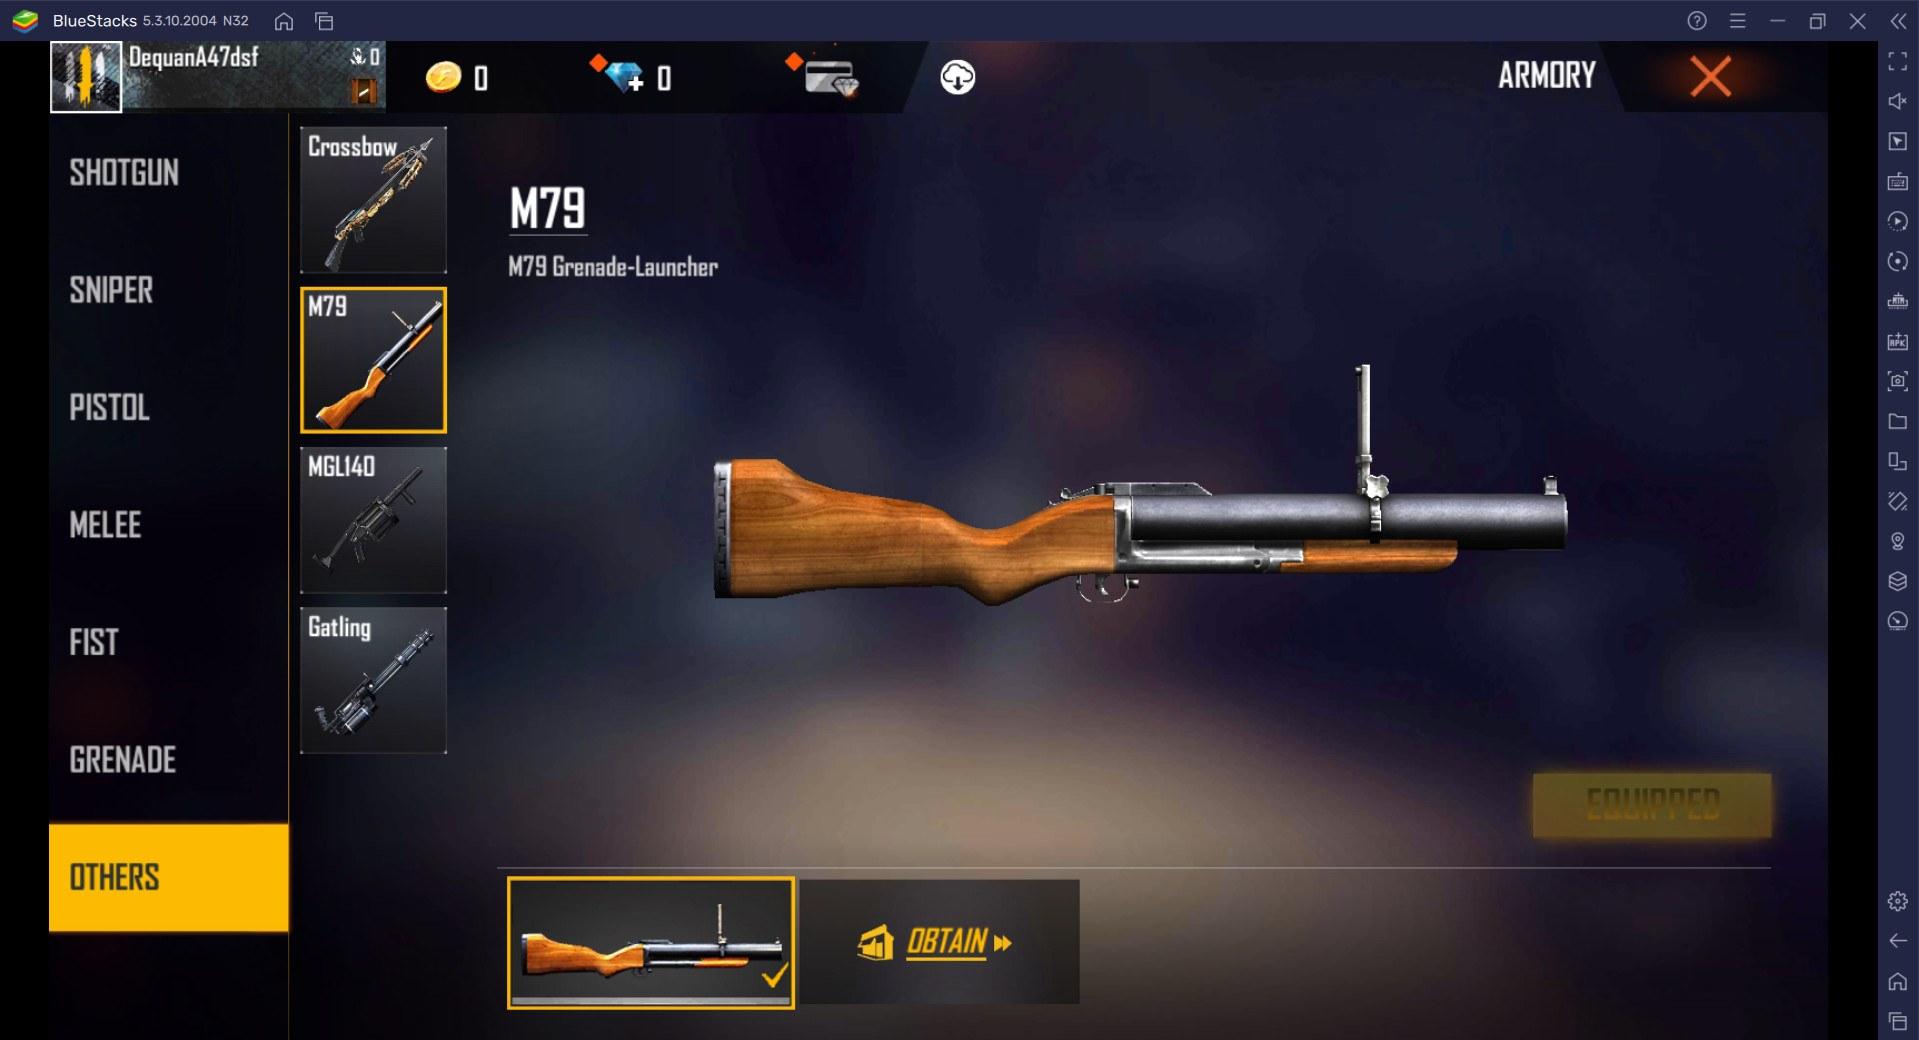 Free Fire แนะนำอาวุธ : ปืน 10 อันดับที่แนะนำ